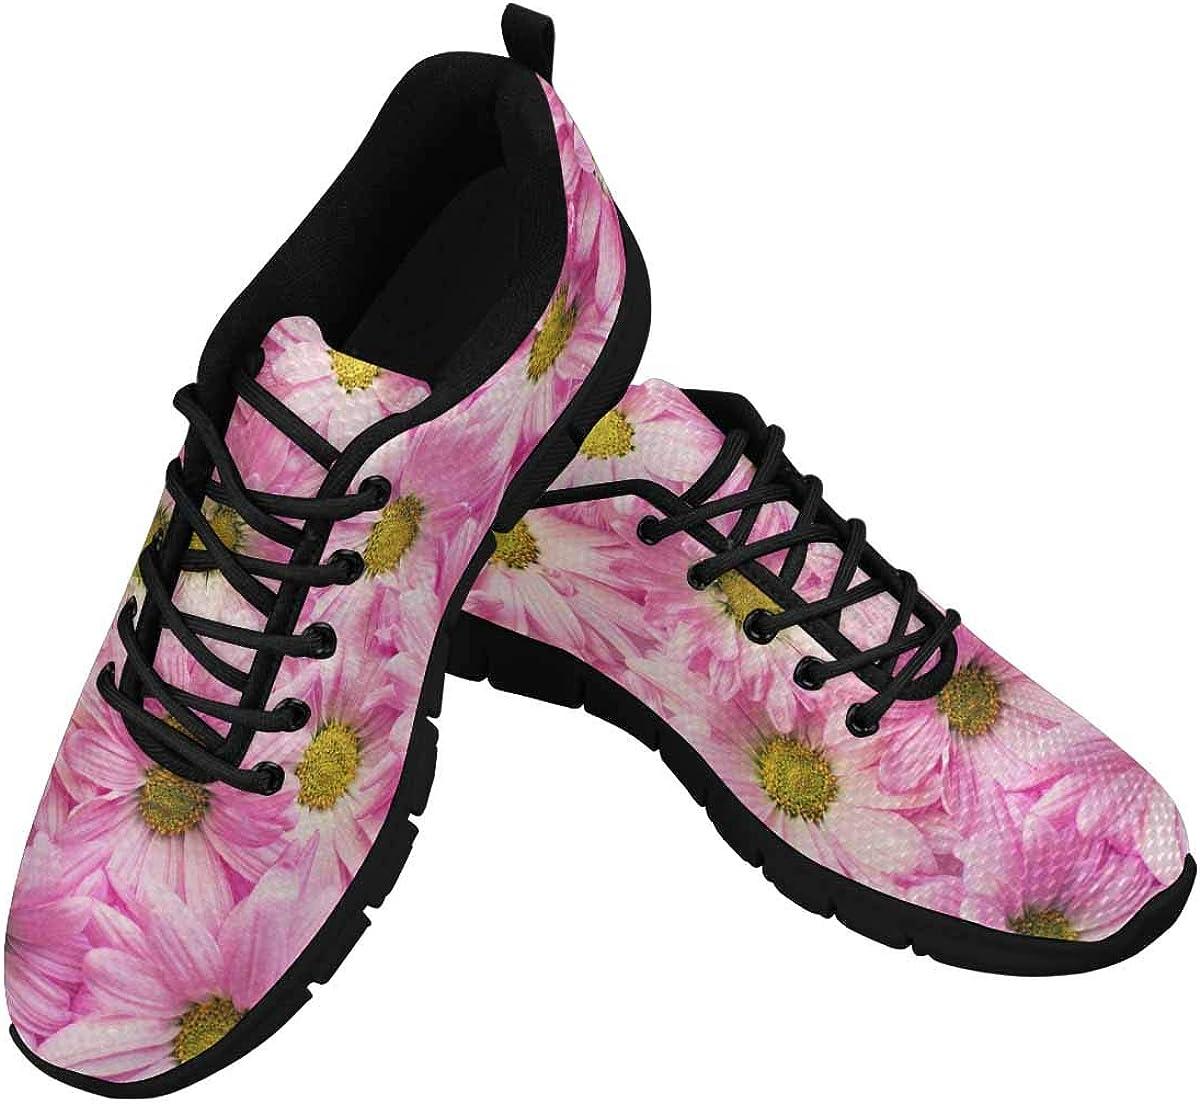 INTERESTPRINT Pink Flowers Background Women's Athletic Walking Shoes Casual Mesh Comfortable Work Sneakers